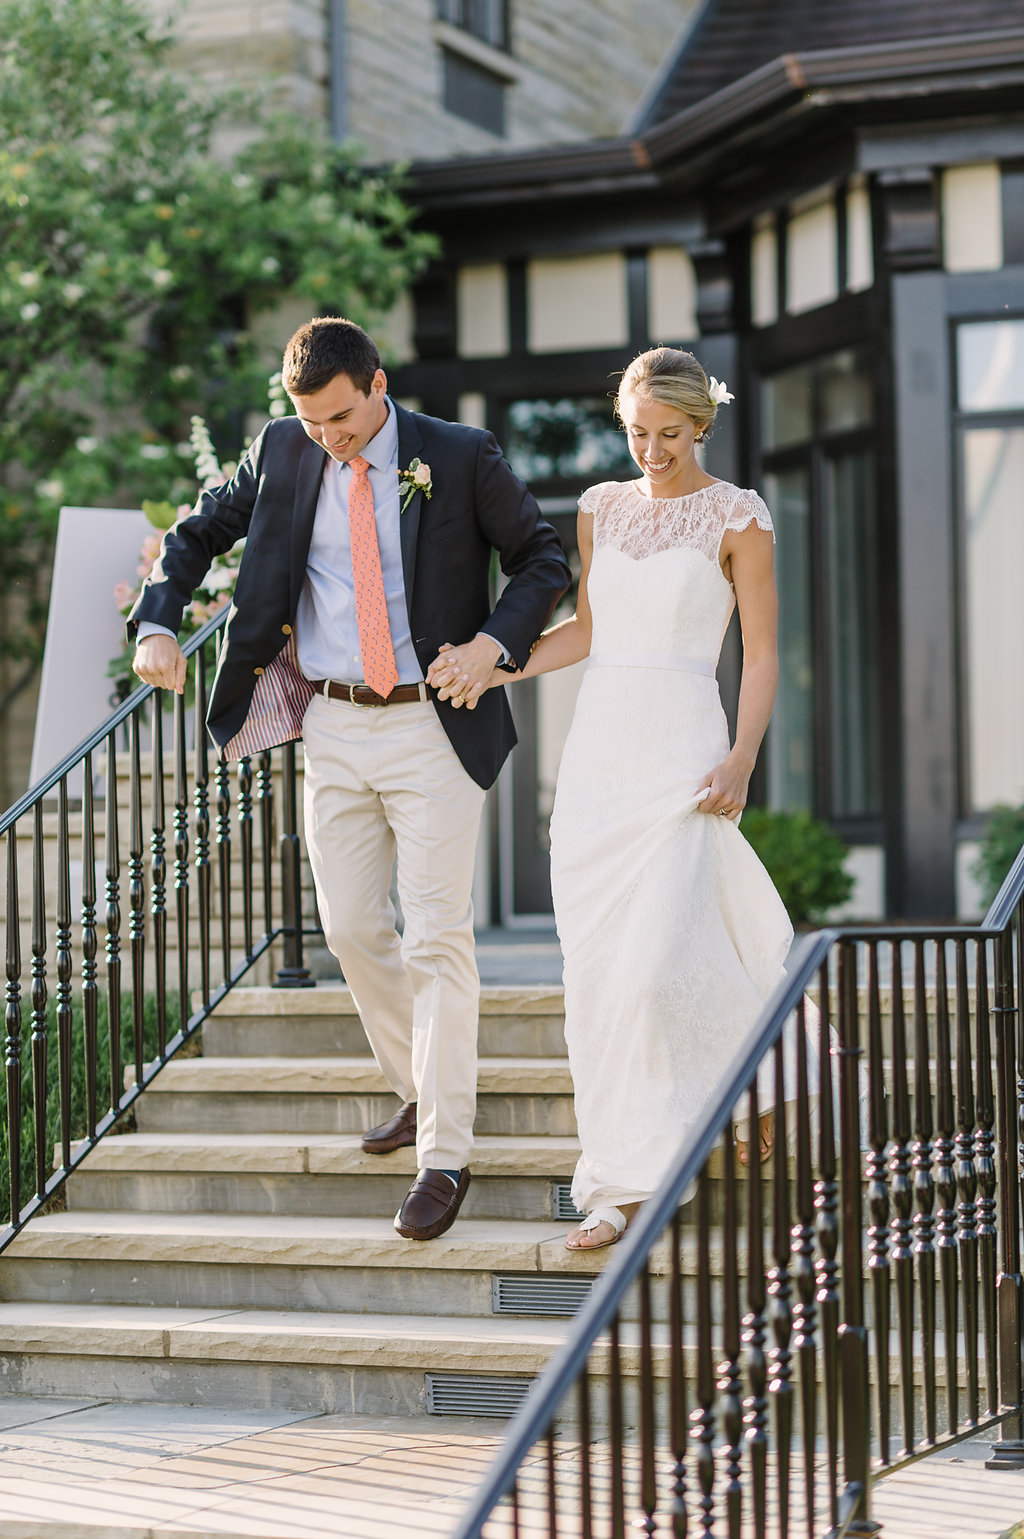 Cameron-Powel-Wes-Mize-wedding-20160618-502.jpg